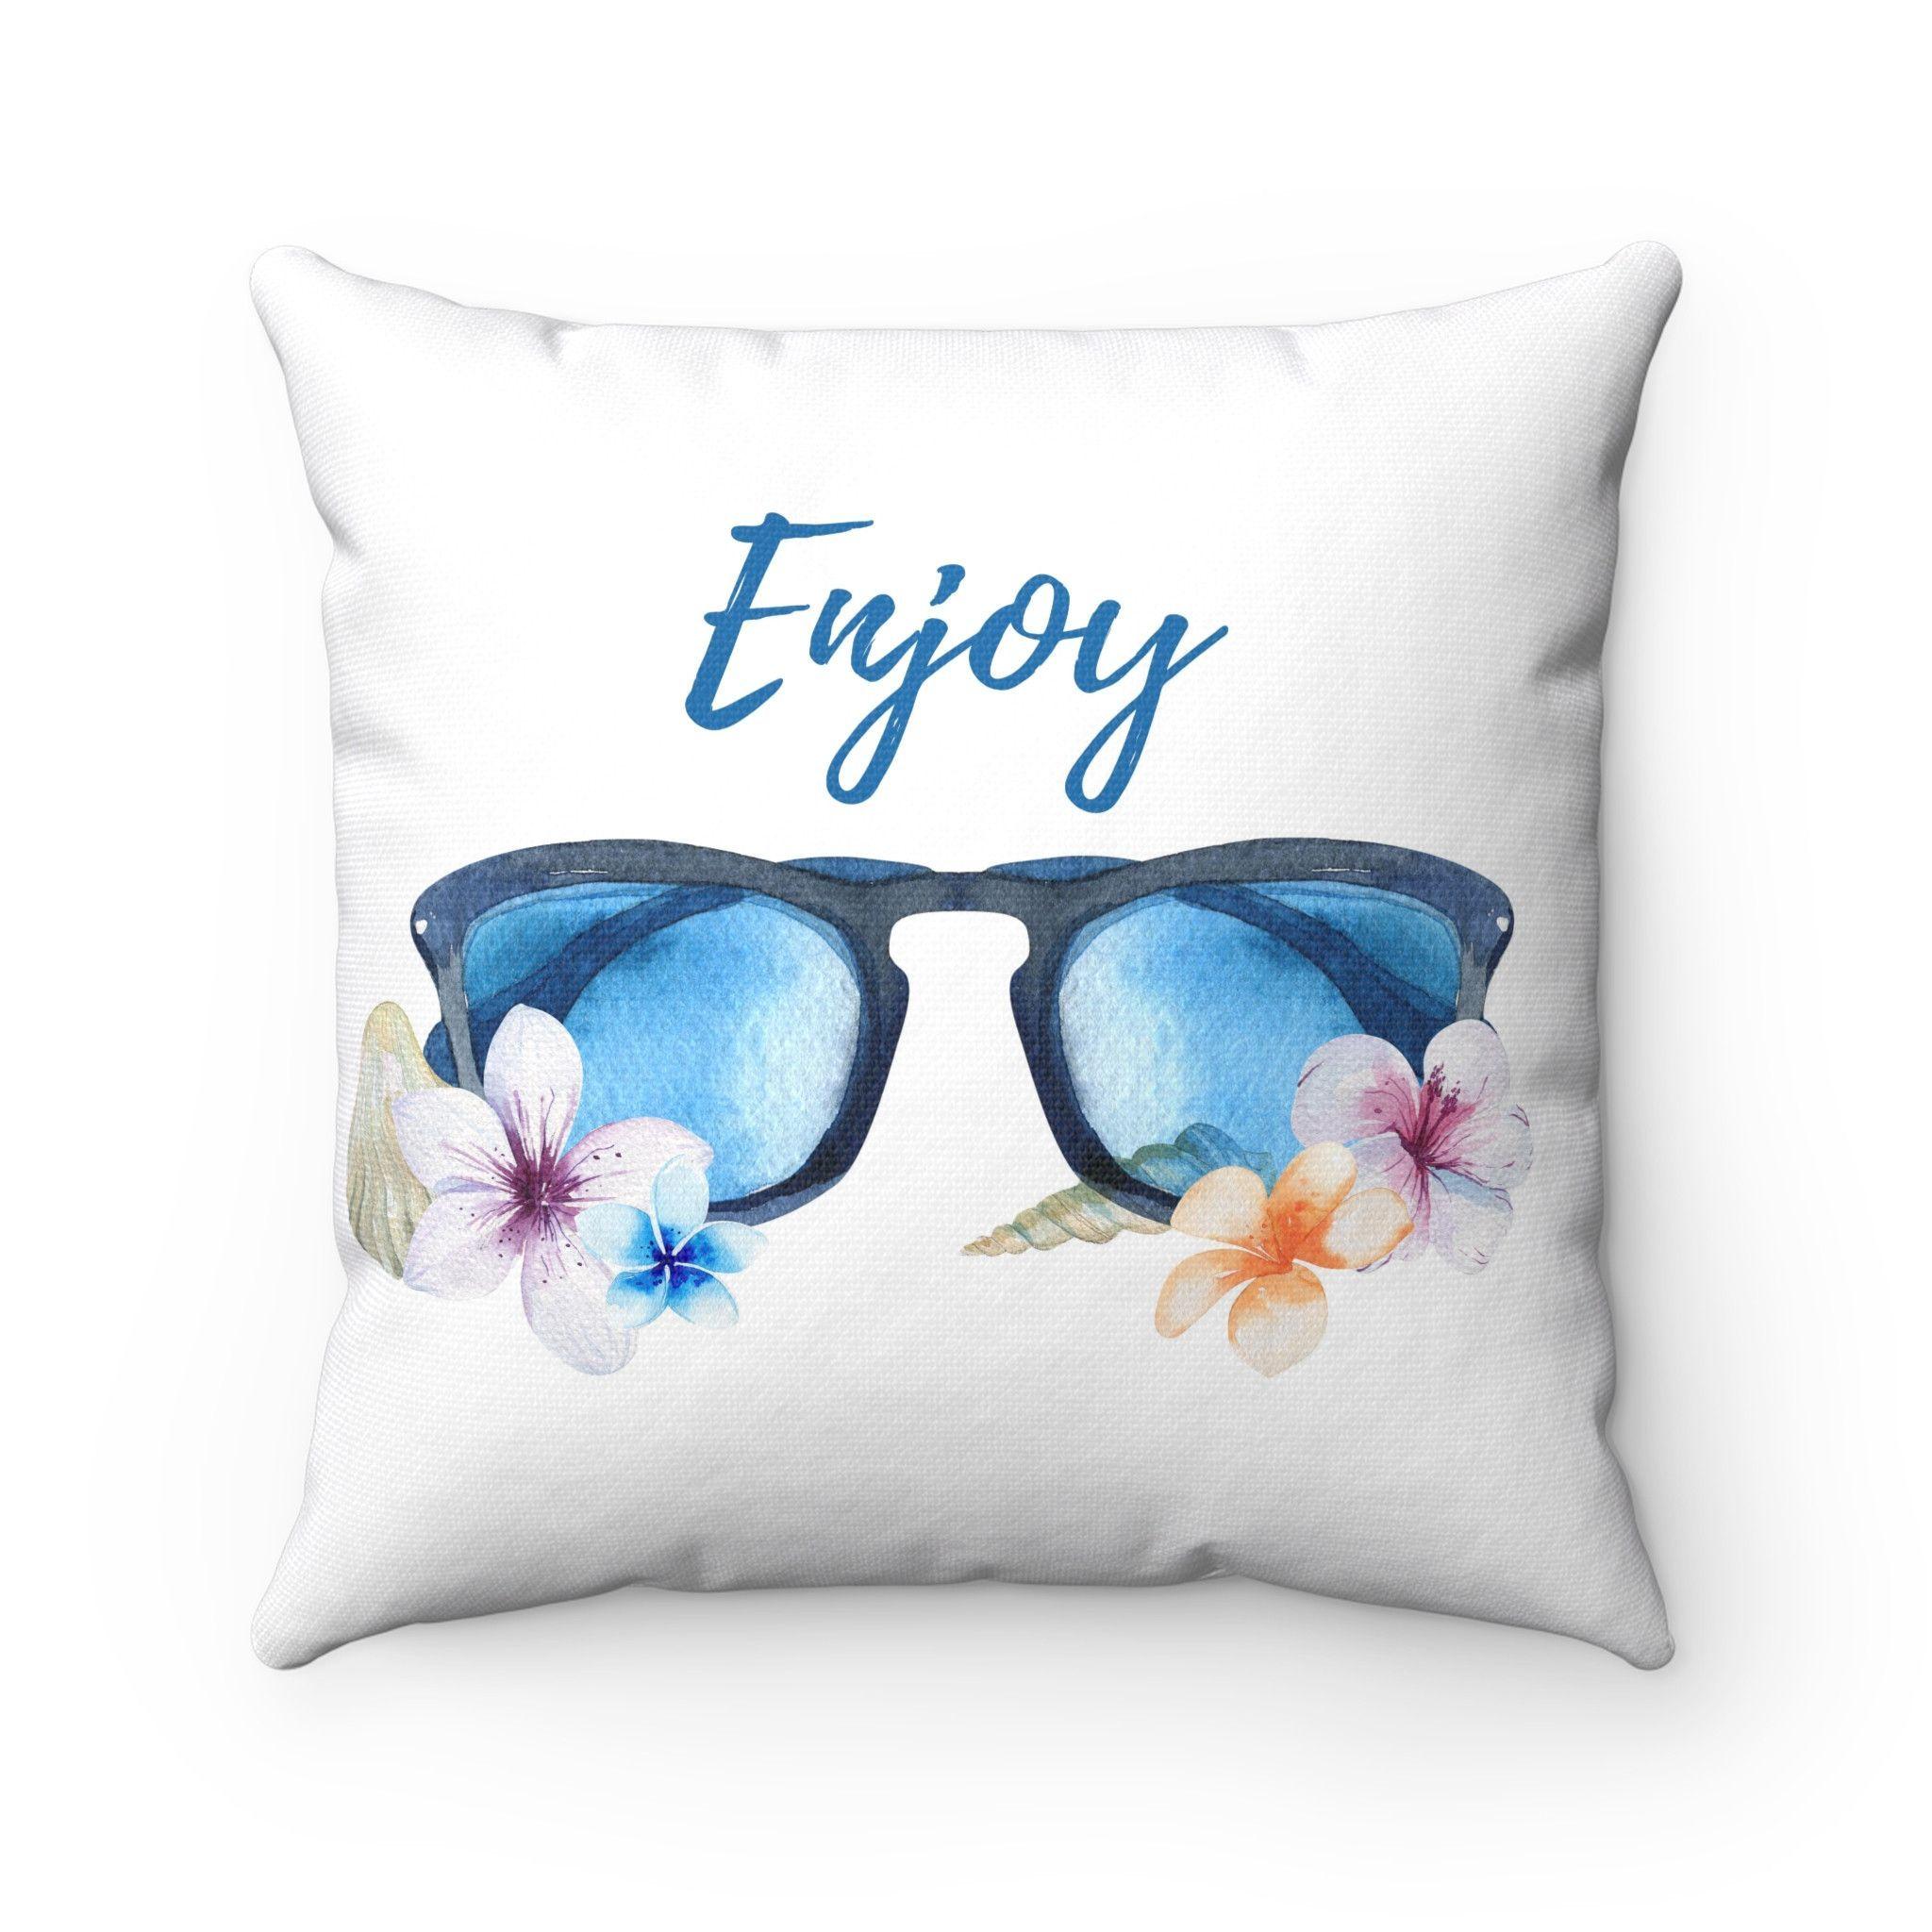 Beach House Decorative Throw Pillows Tropical Theme Home Decor 4